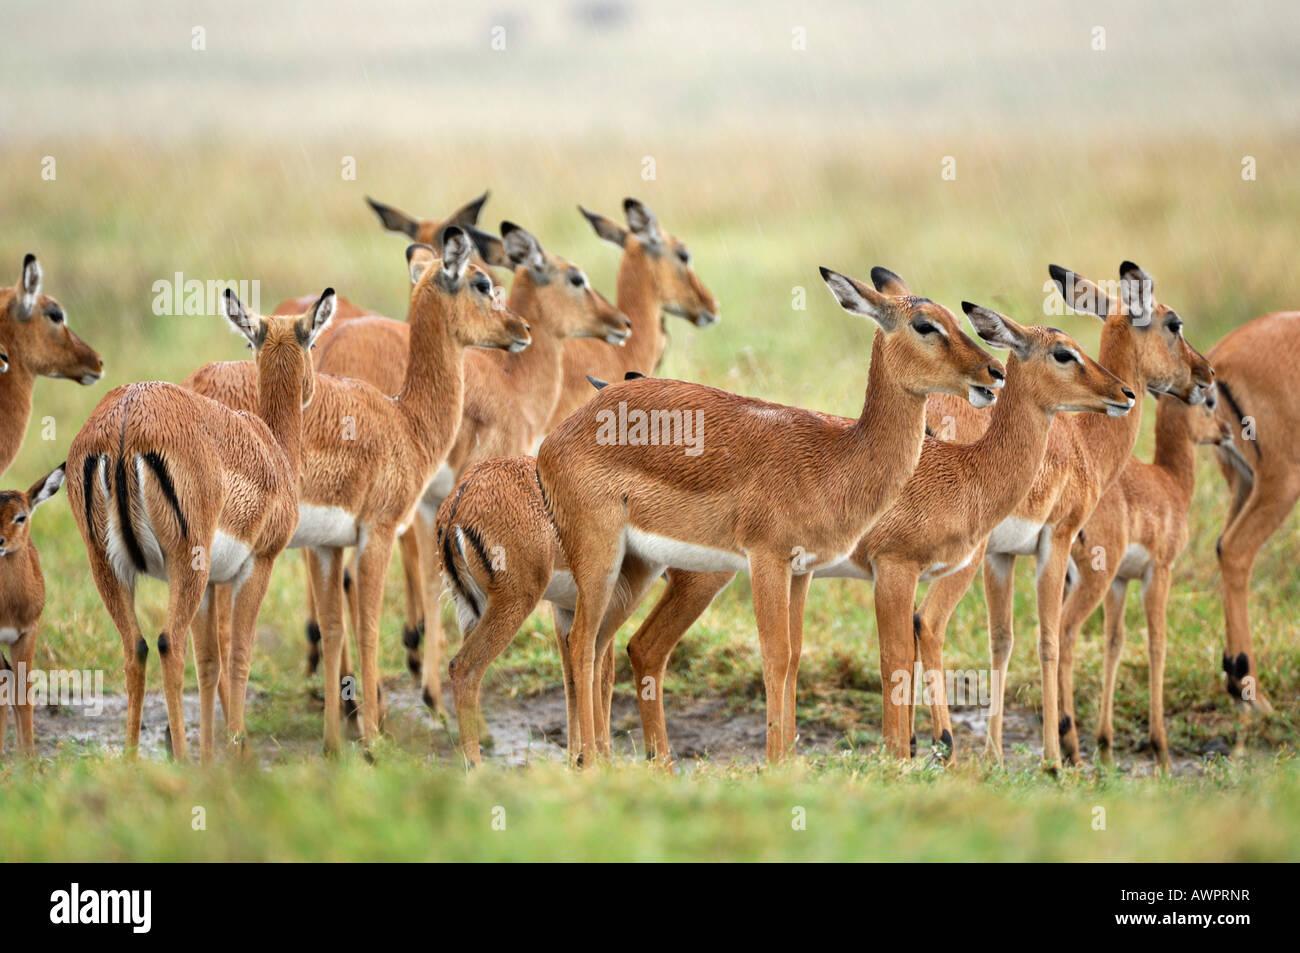 Gruppe von Impalas (Aepyceros Melampus), stehen im Regen, Lake Nakuru, Kenia, Afrika Stockbild